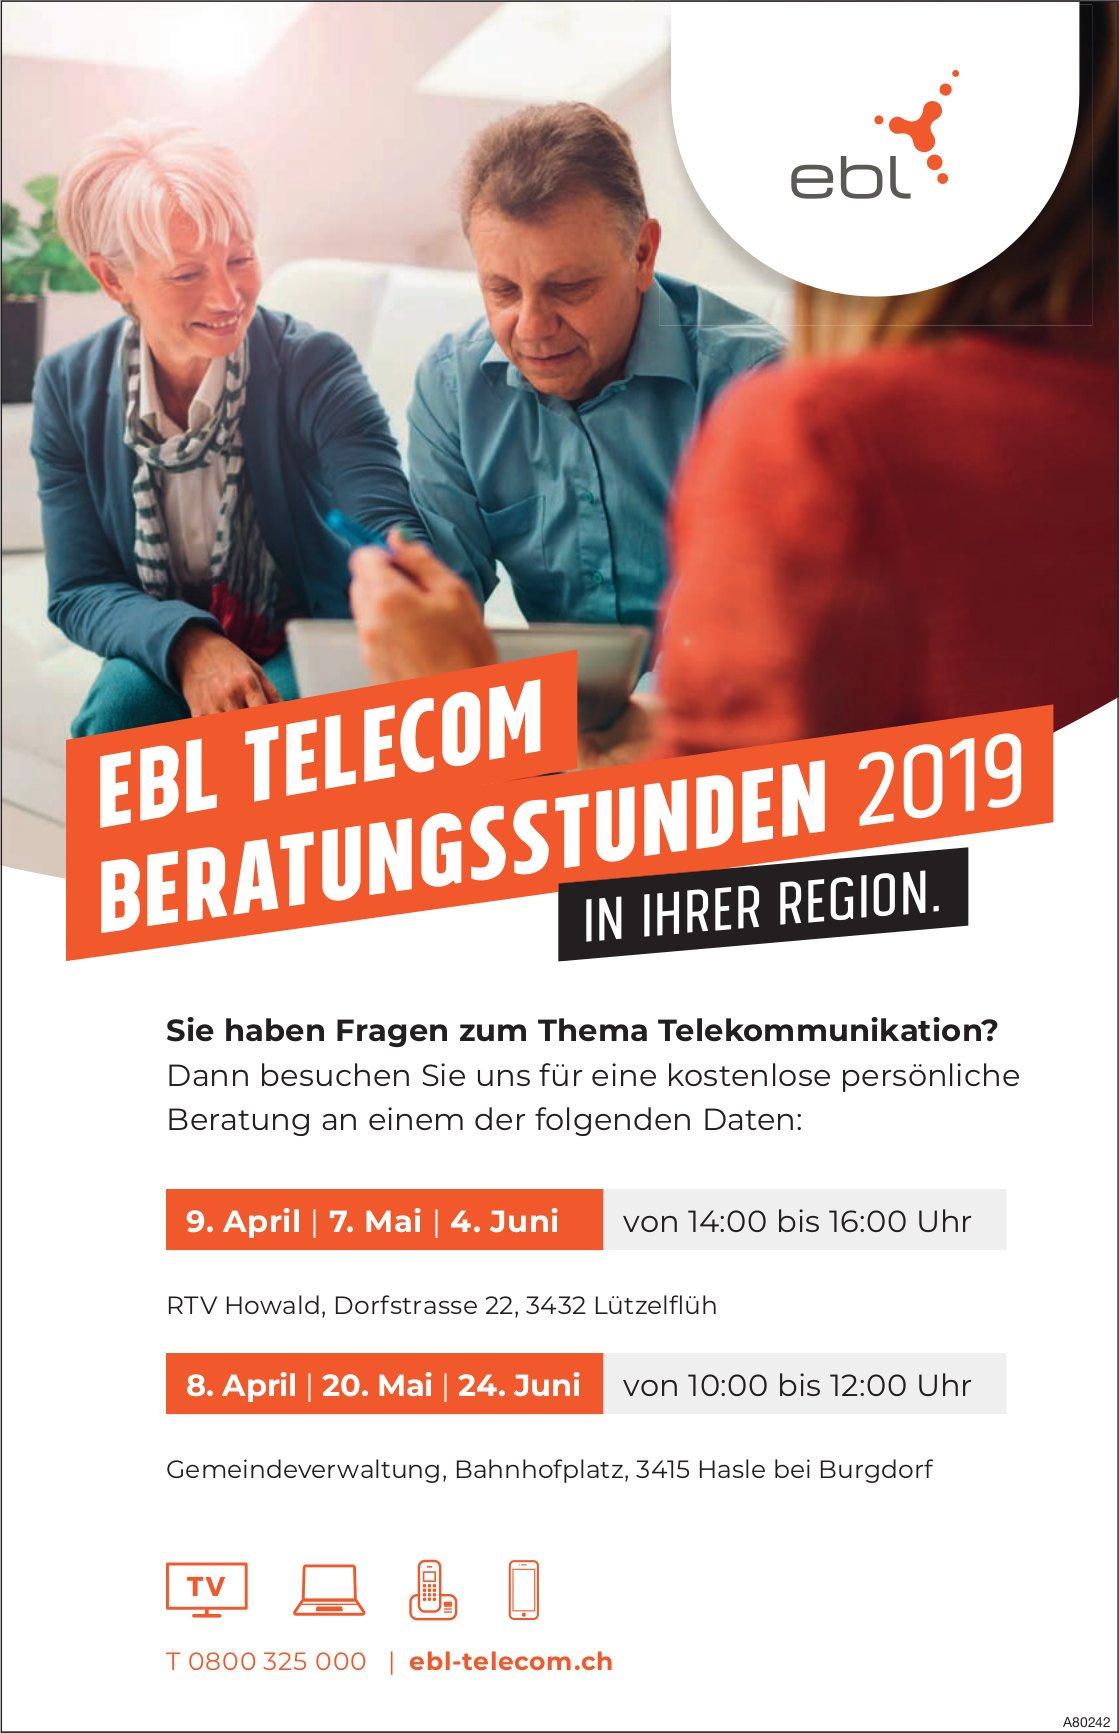 EBL TELECOM BERATUNGSSTUNDEN 2019, 4. + 24. Juni, Lützelflüh und Hasle b. Burgdorf